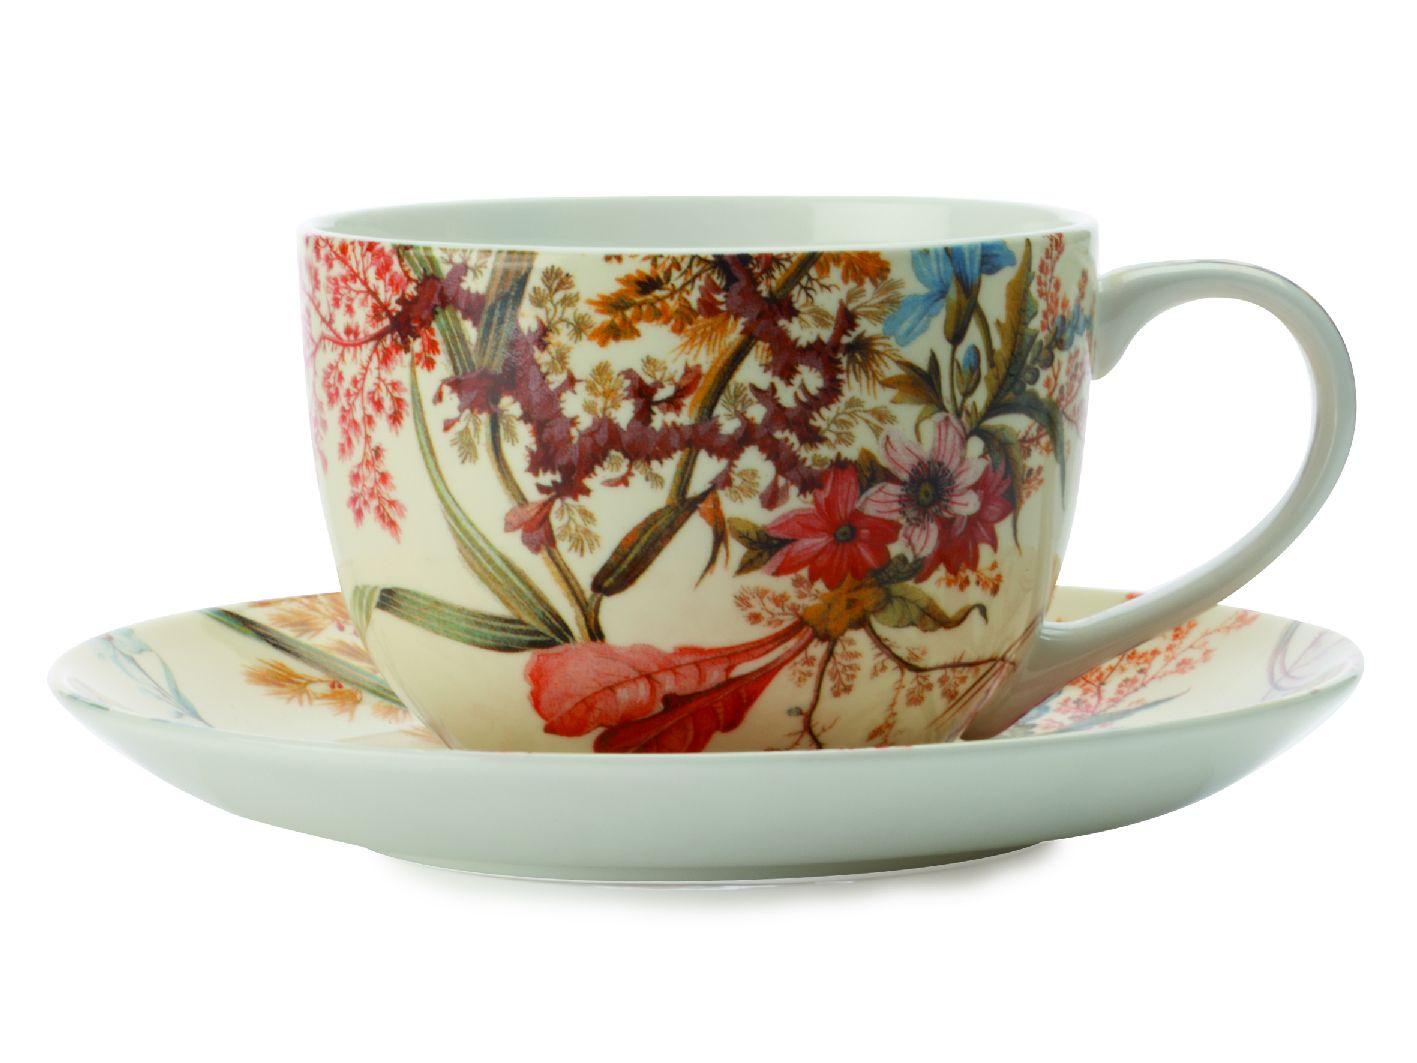 Šálek s podšálkem Cottage Blossom 250 ml William Kilburn - Maxwell&Williams